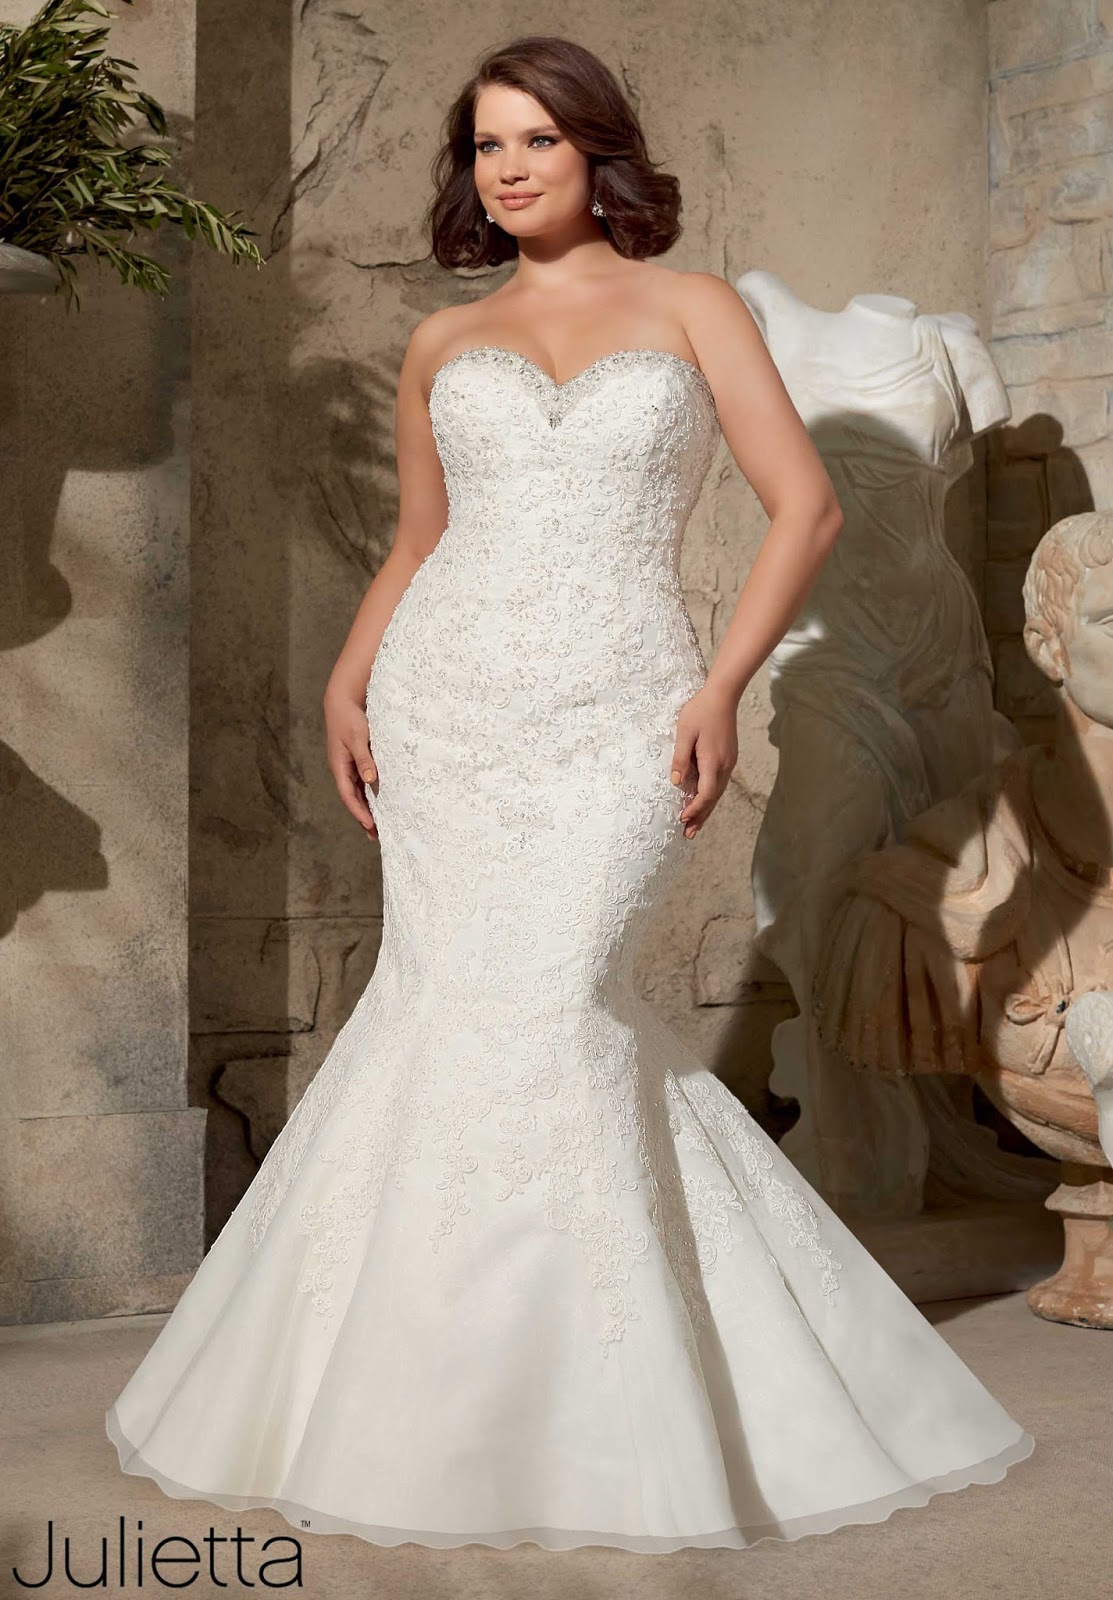 wedding dresses cold climates: Wedding Dresses Under 1000 Toronto